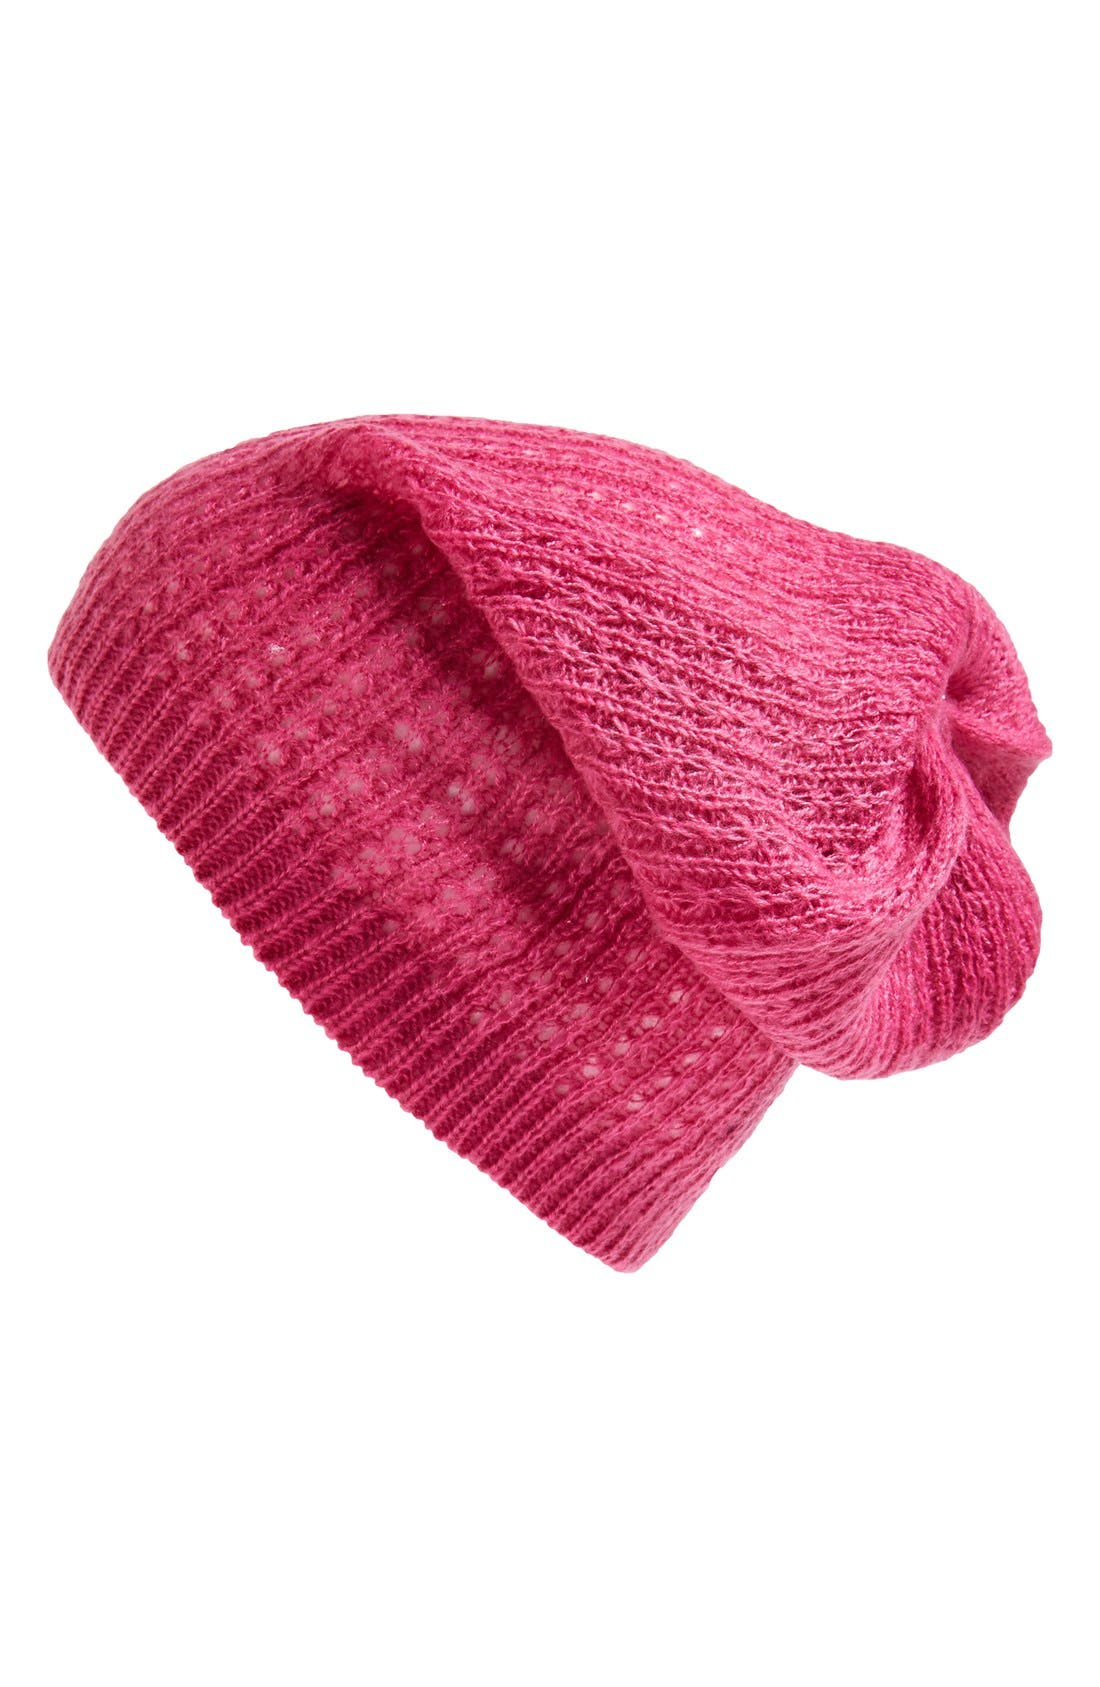 Main Image - Tildon Waffle Knit Slouch Hat